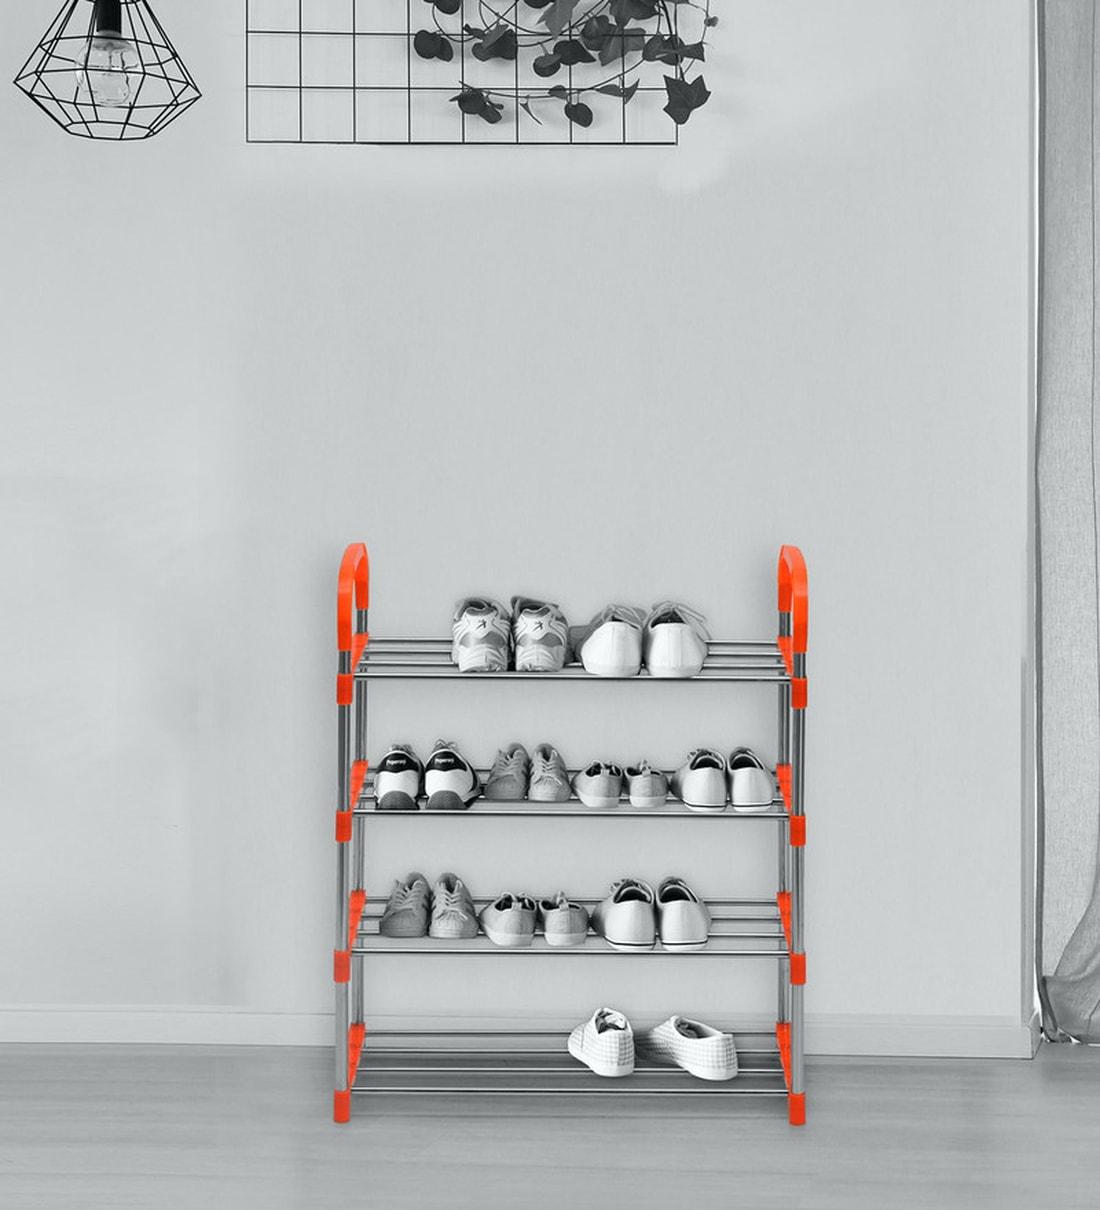 Buy Proxima Shoe Rack in Orange Colour